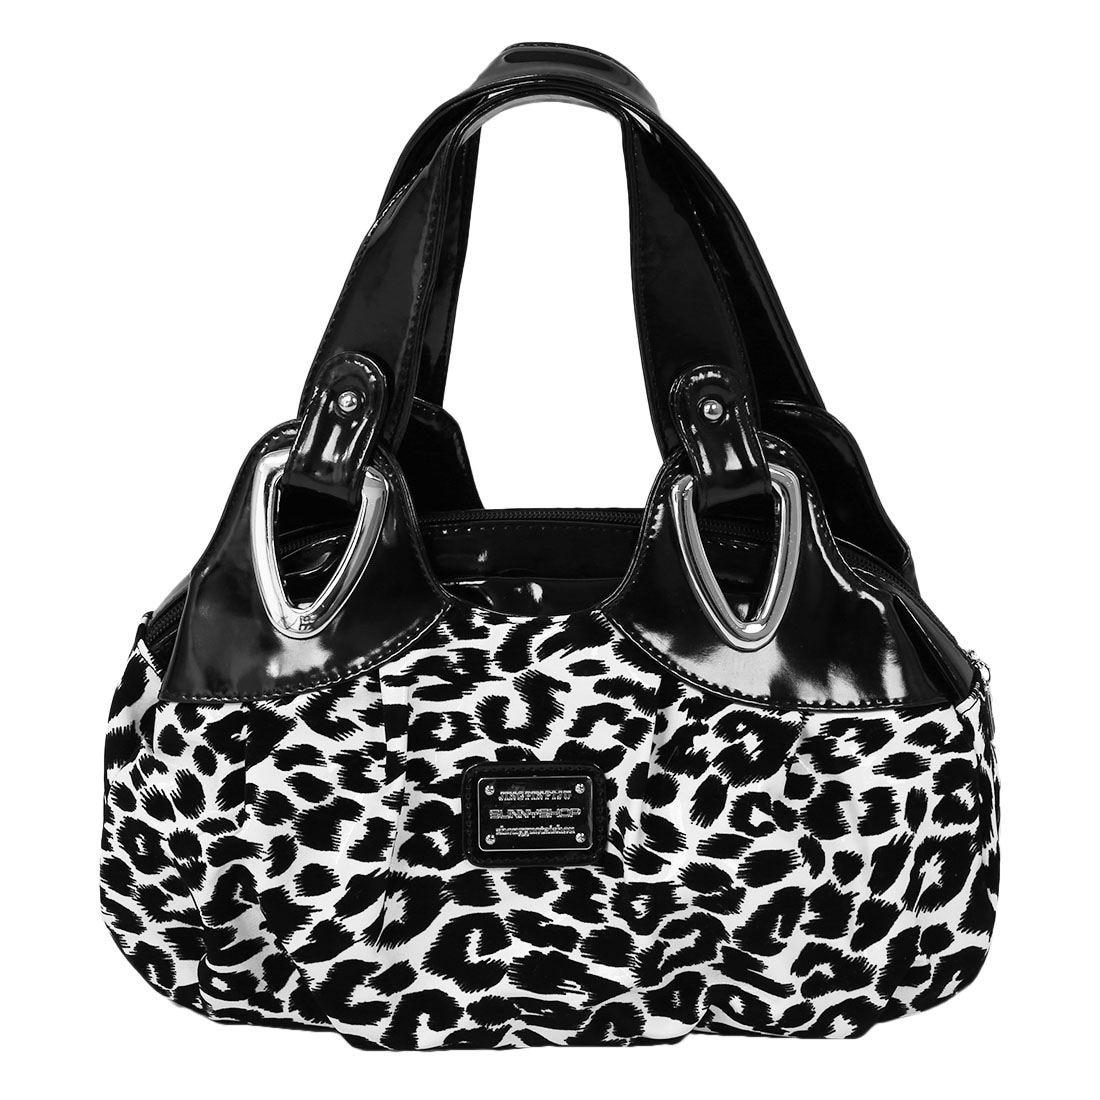 Fashion handbag Women PU leather Bag Tote Bag Handbags Satchel -Black+white leopard